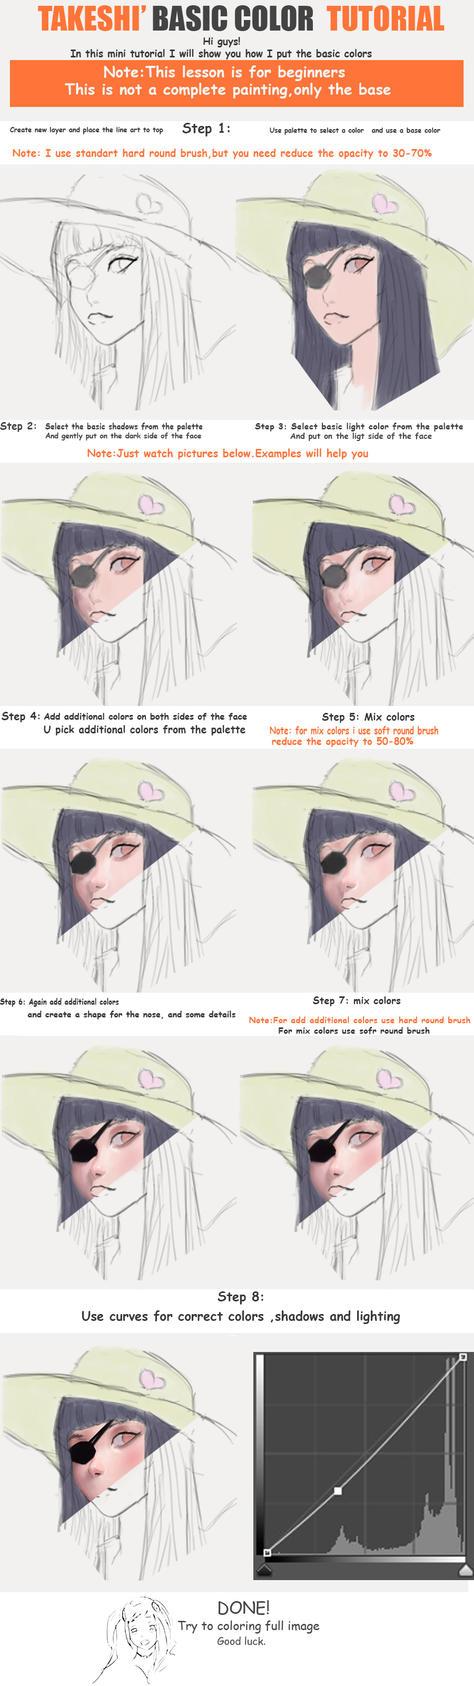 Character Design Tutorial Beginner : Tutorial character for beginner easy way on drawing